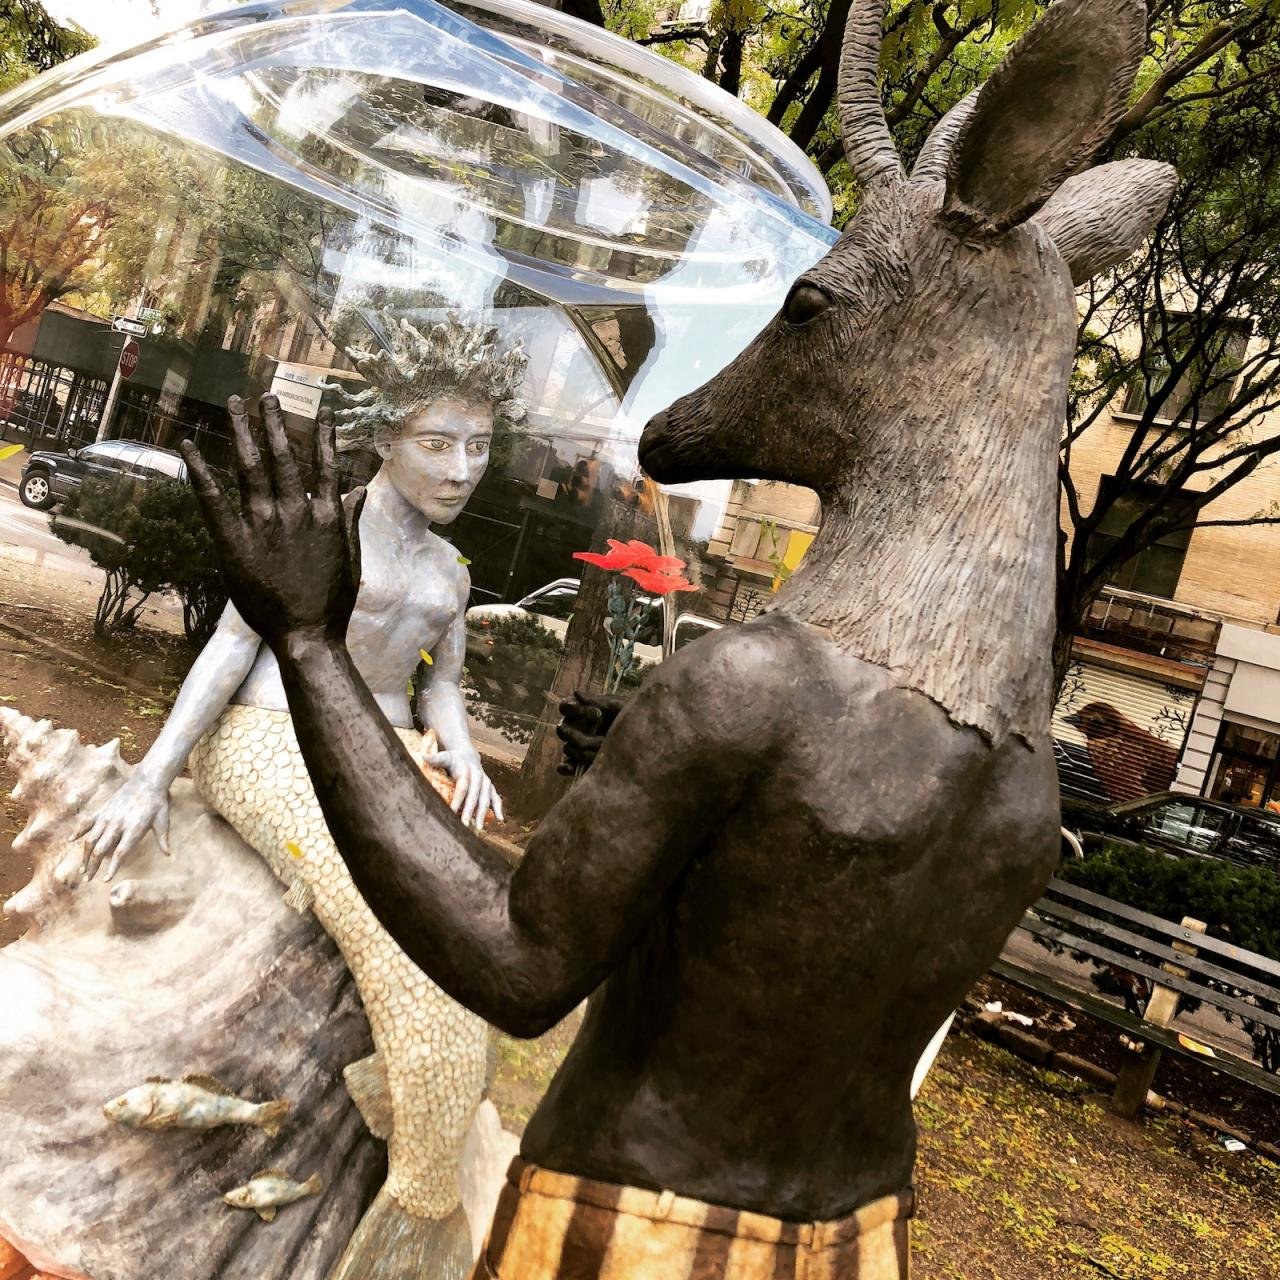 Chimeric sculpture by Kathy Ruttenberg, West 157th Street outside Boston Market